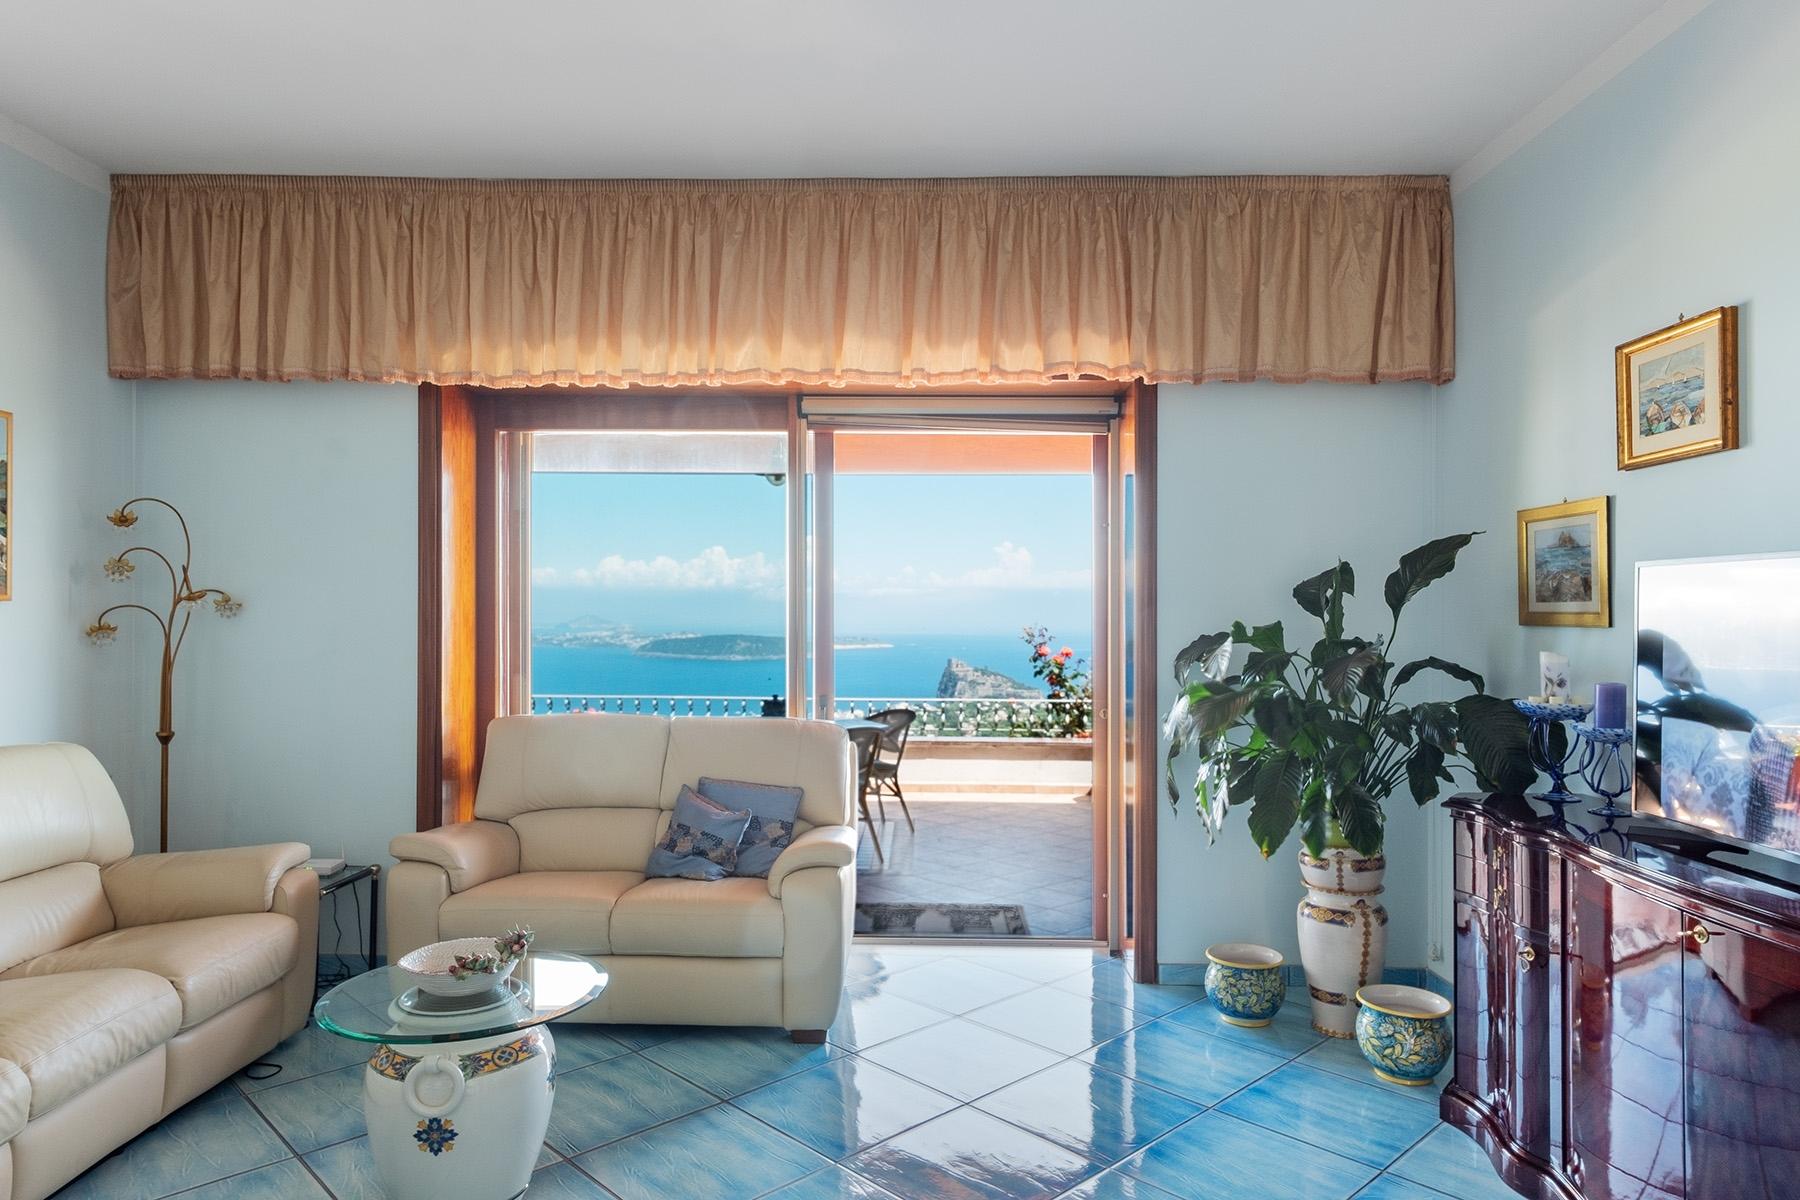 Villa in Vendita a Ischia: 5 locali, 138 mq - Foto 24